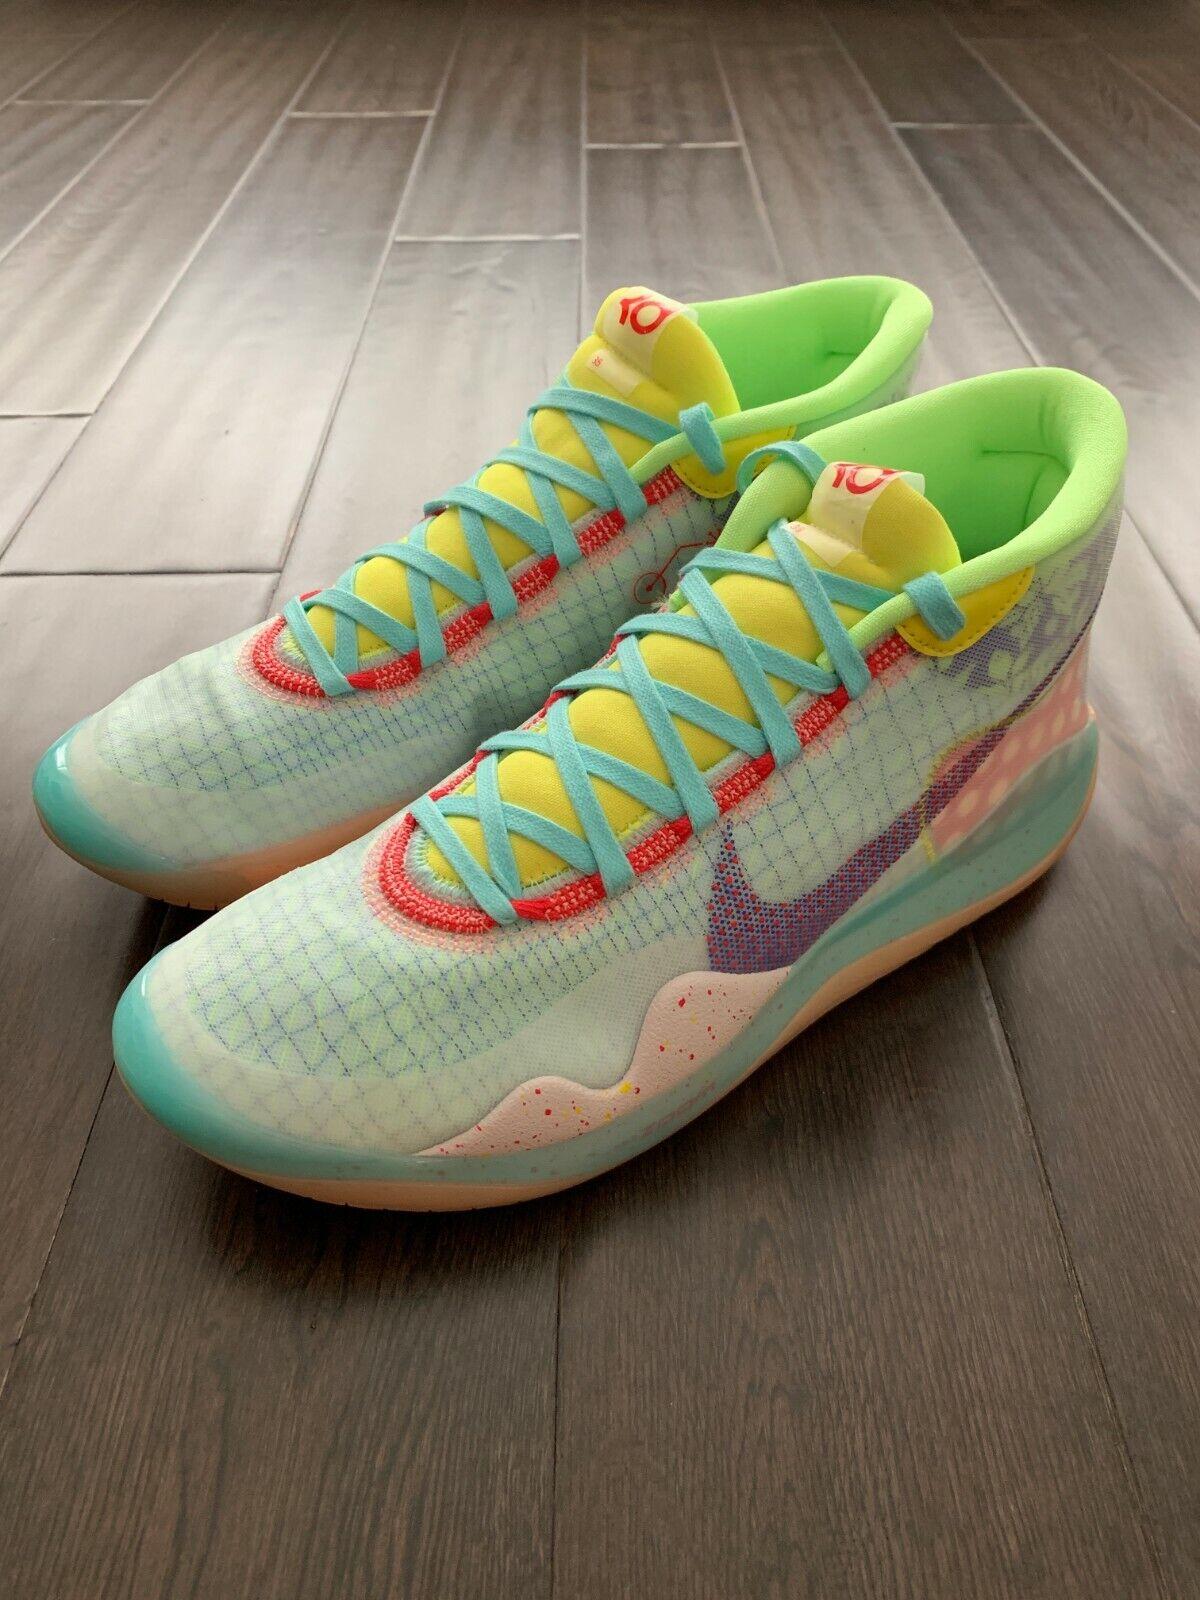 87023edac64 Nike Zoom KD12 Peach Jam EYBL NRG Basketball Shoes Men's 10.5 Kevin Durant  KD 12